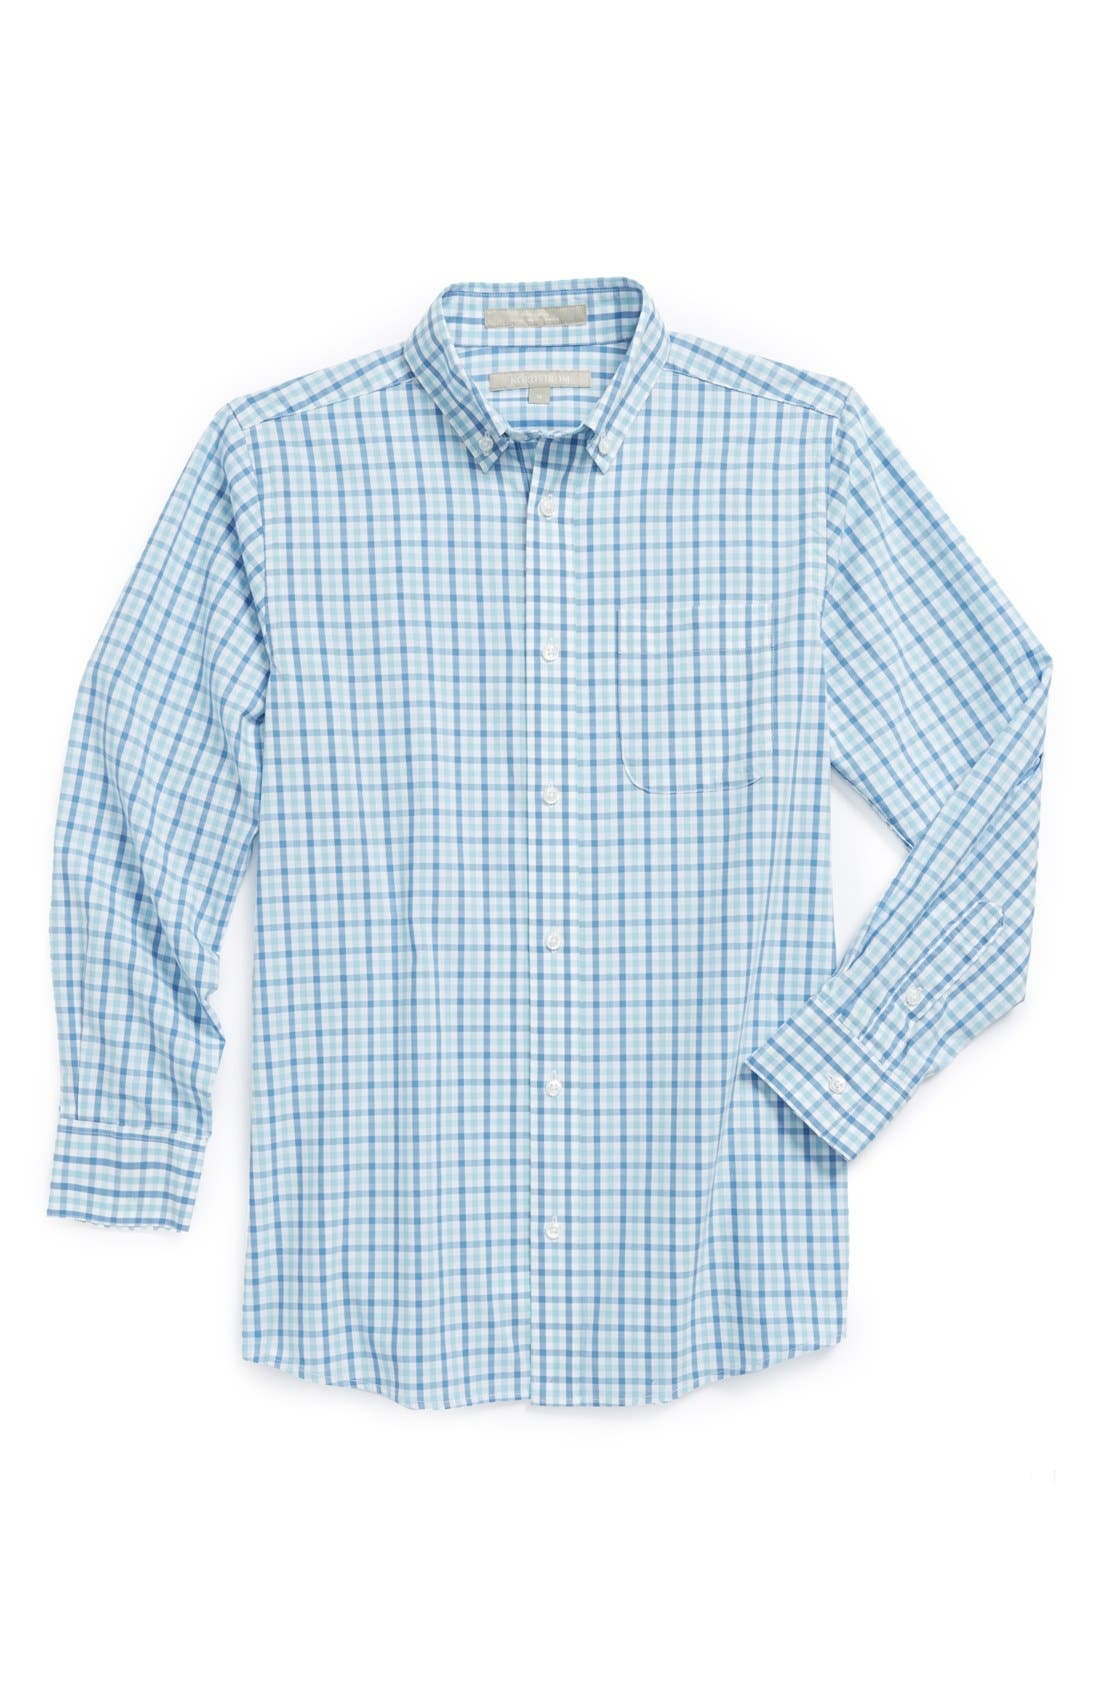 Main Image - Nordstrom 'Michael' Plaid Dress Shirt (Big Boys)